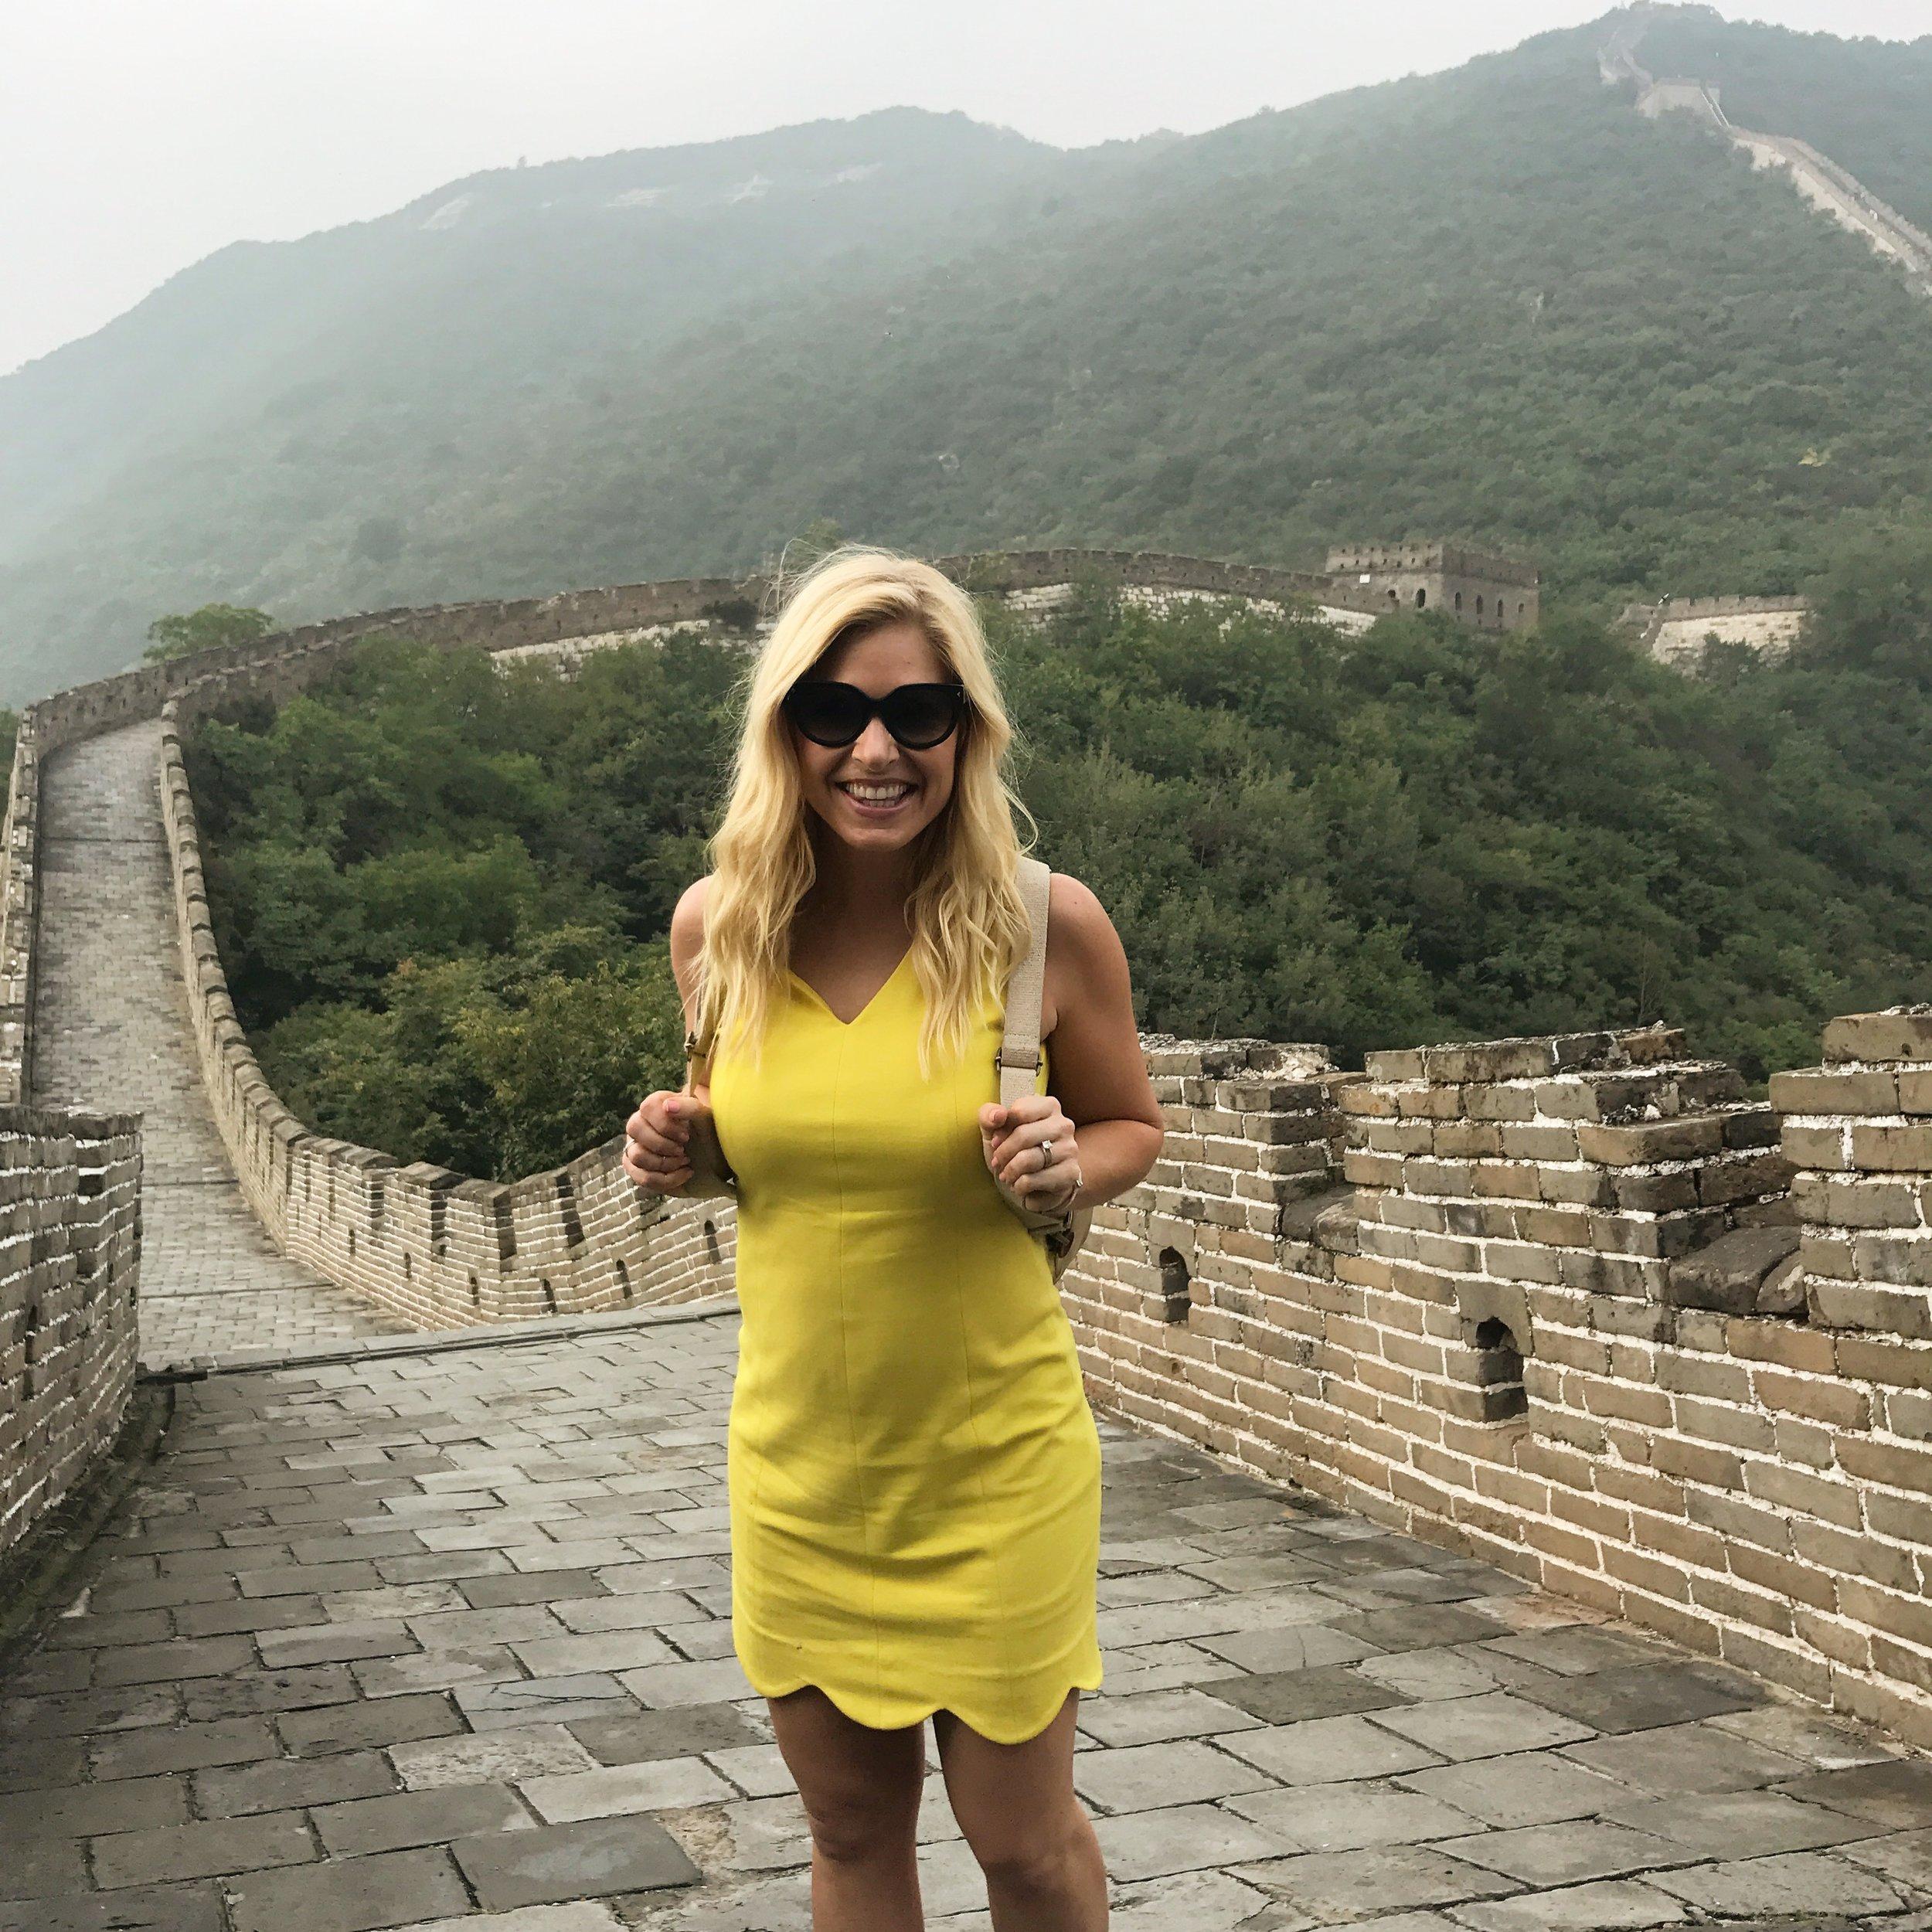 beijing seoul tokyo anna kooiman fitness travel lifestyle fashion asia adventure  Great Wall of China Intercontinental